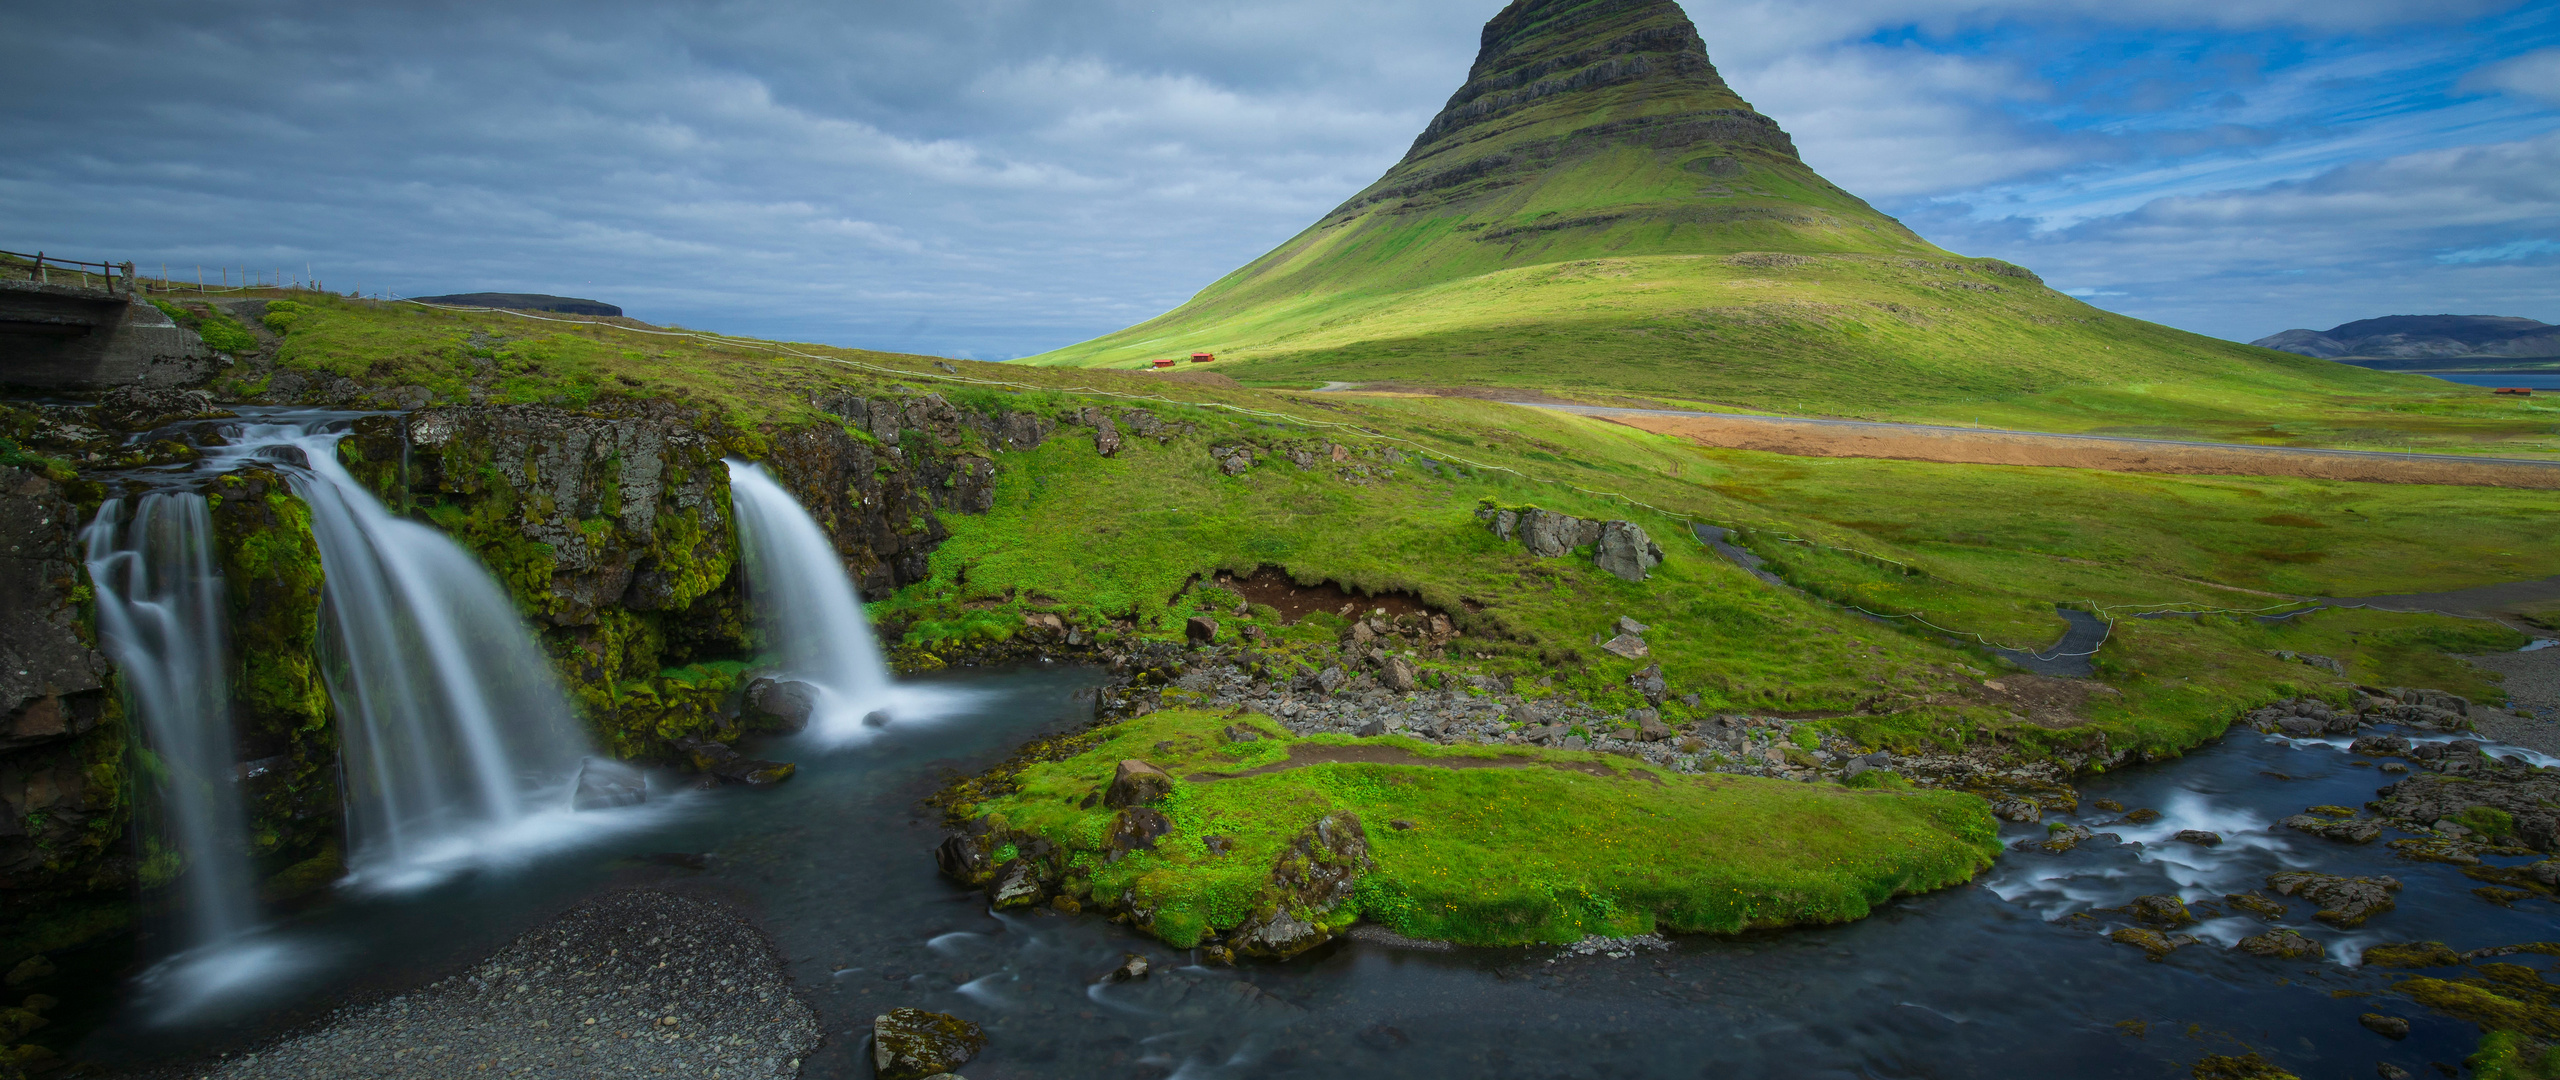 iceland-mountains-waterfalls-kirkjufell-5k-5i.jpg